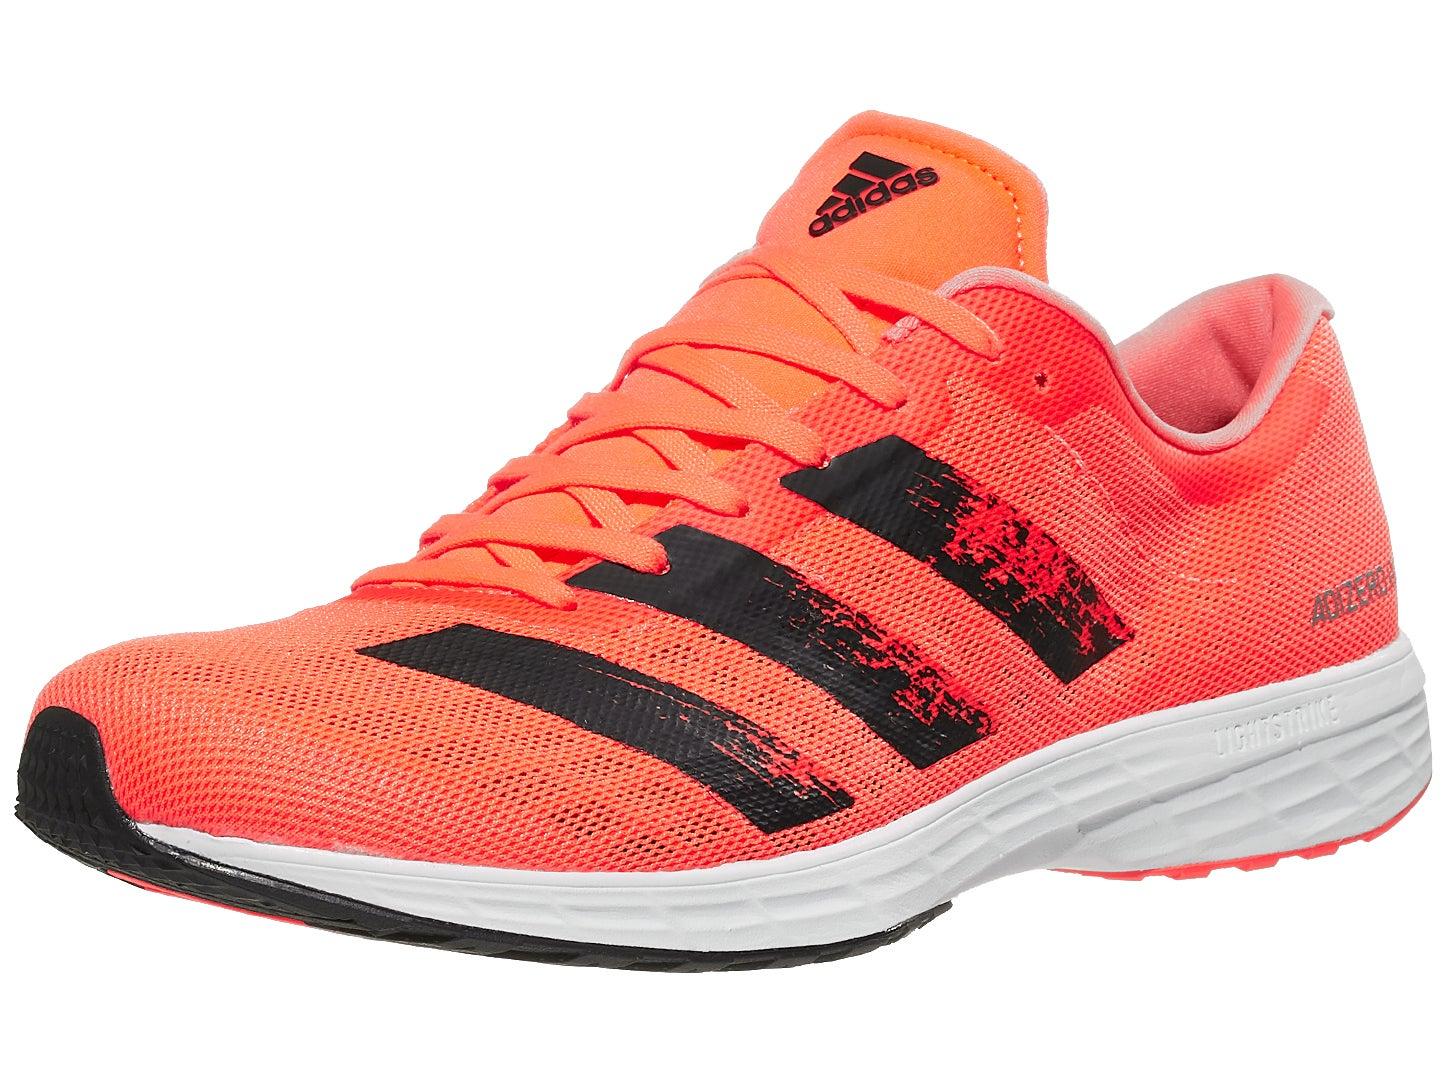 Adidas Adizero RC 2 | Running Shoes Guru